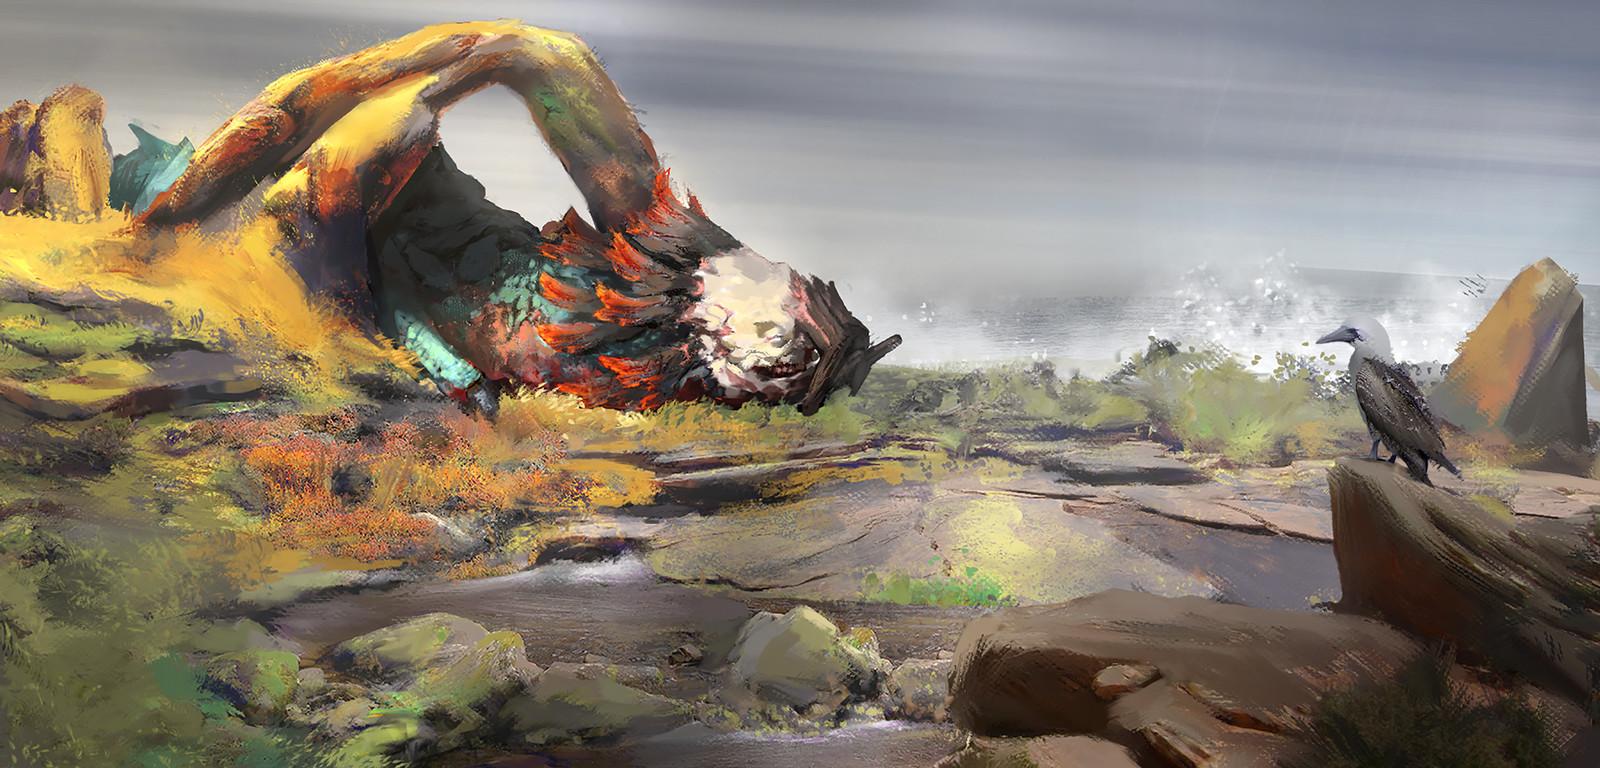 Dragon - Environment